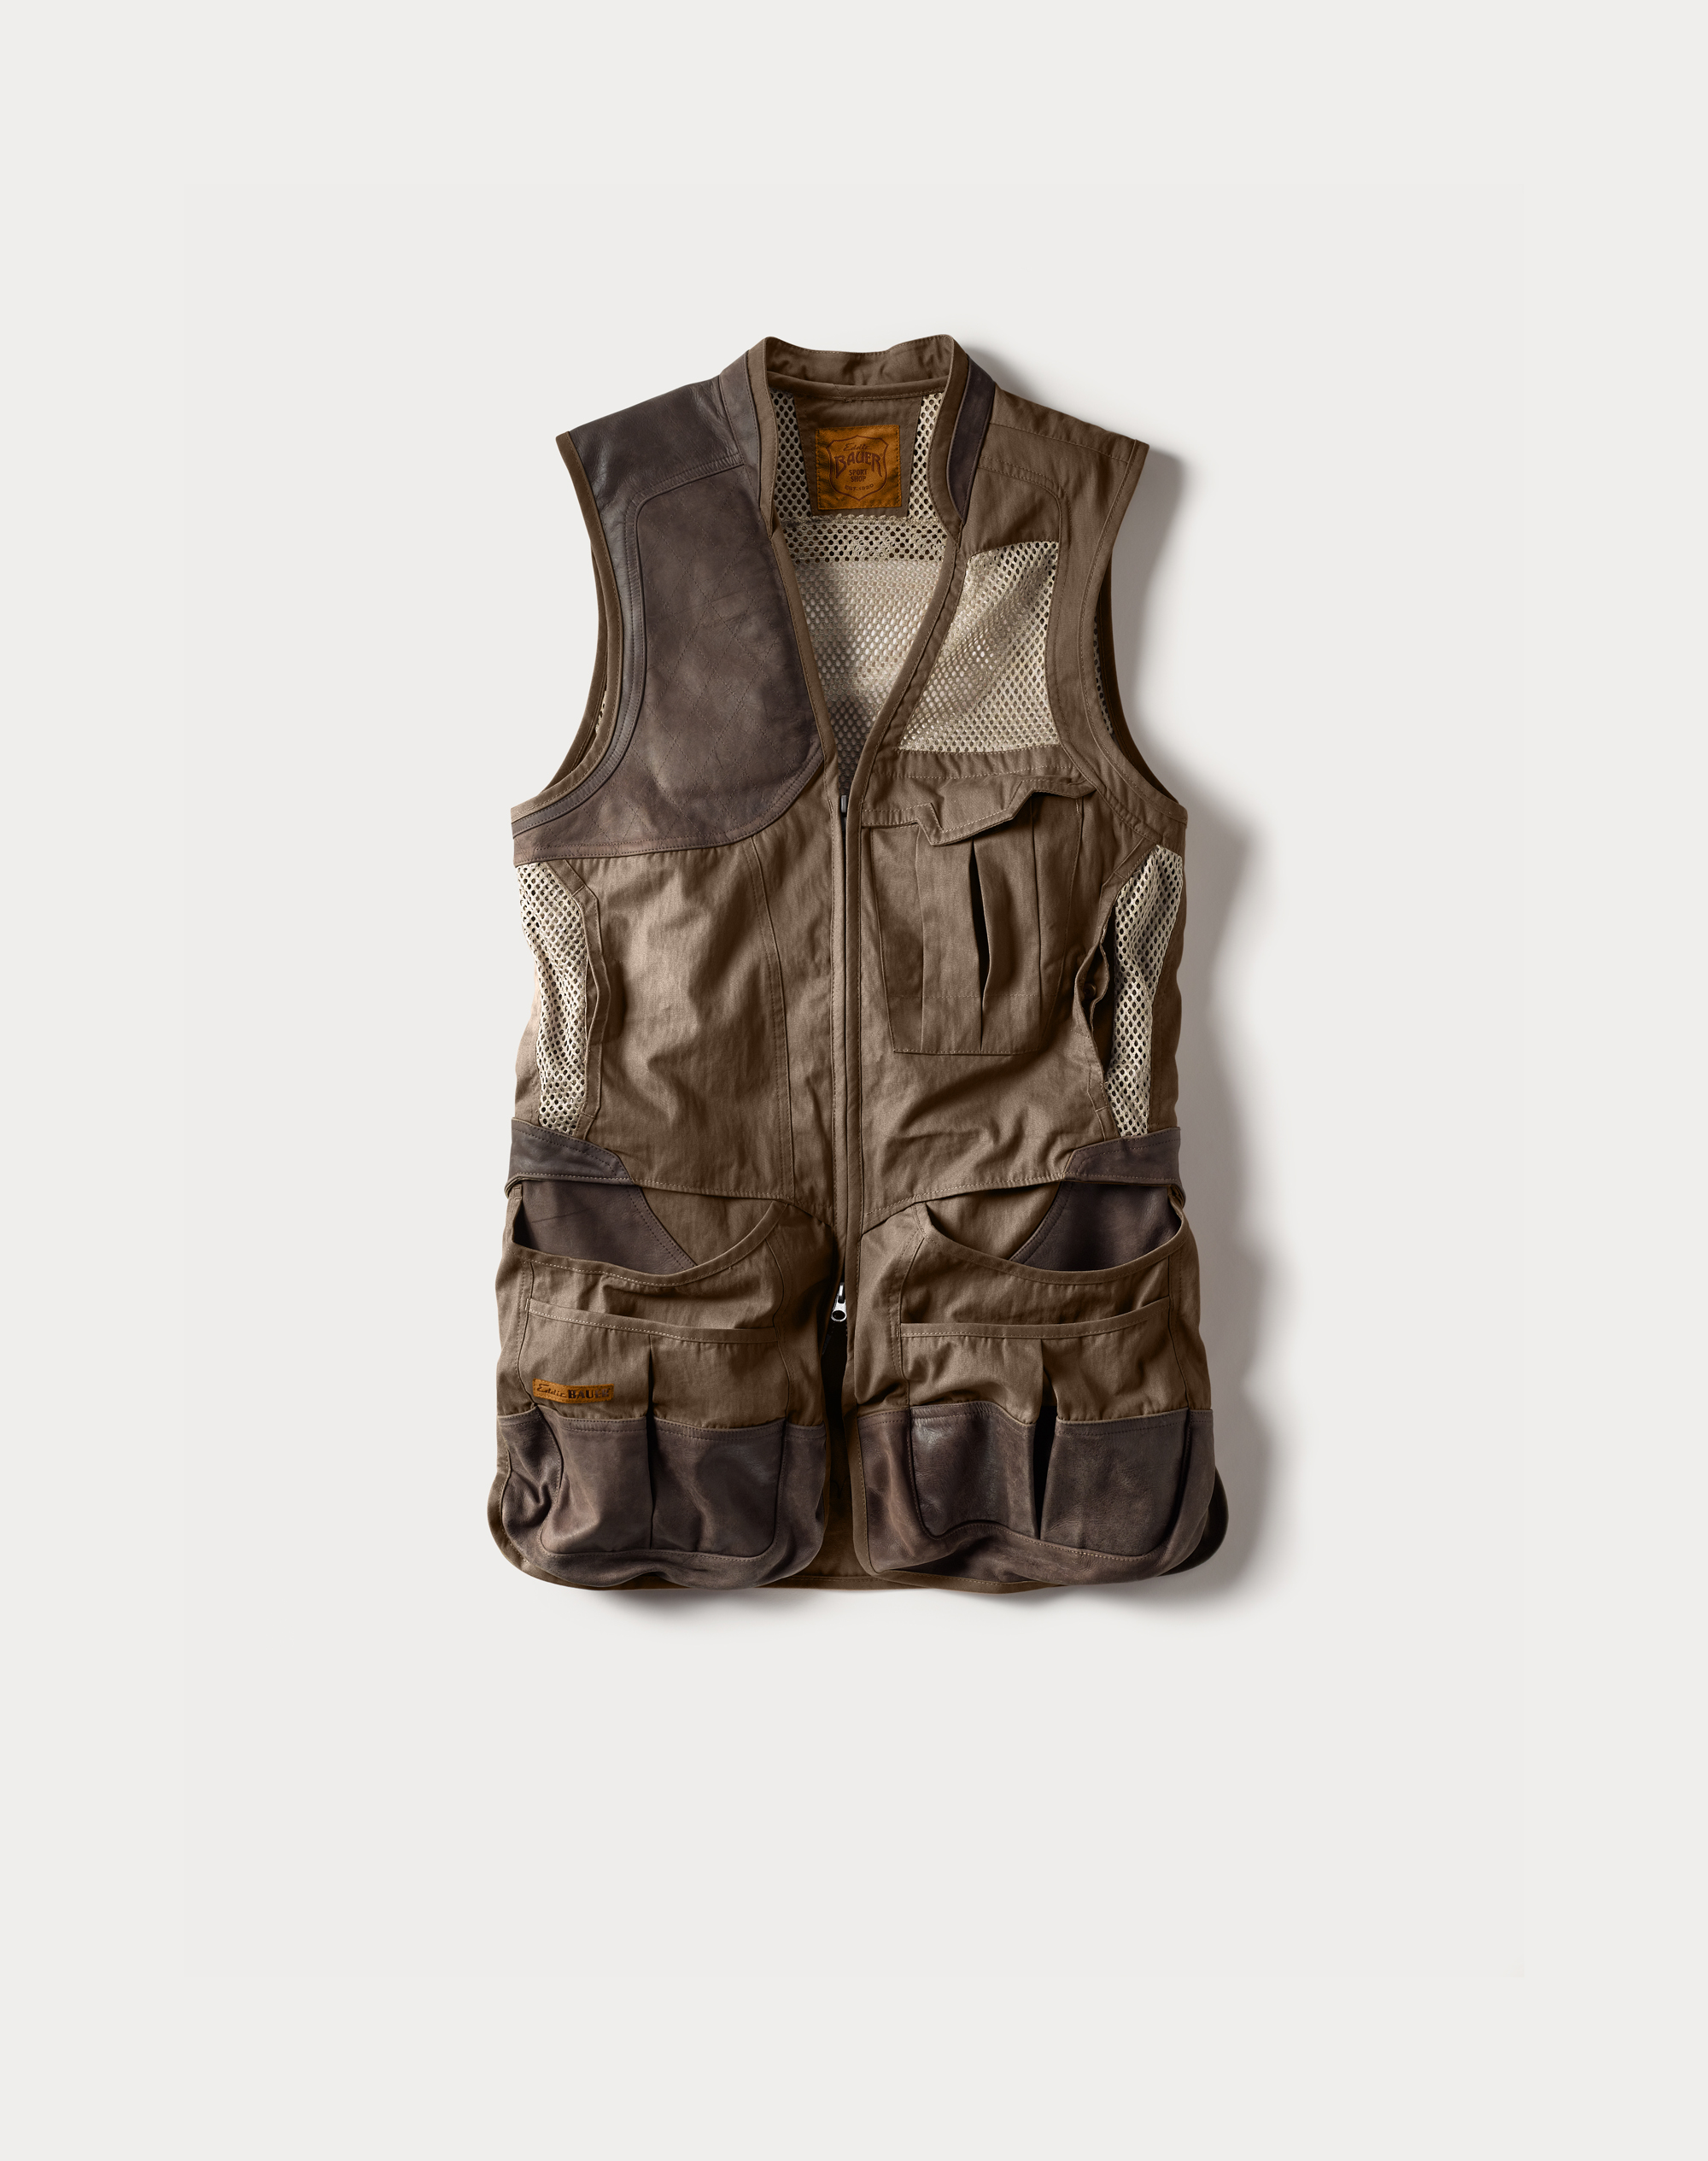 Clay Break Premium Shooting Vest - Acorn